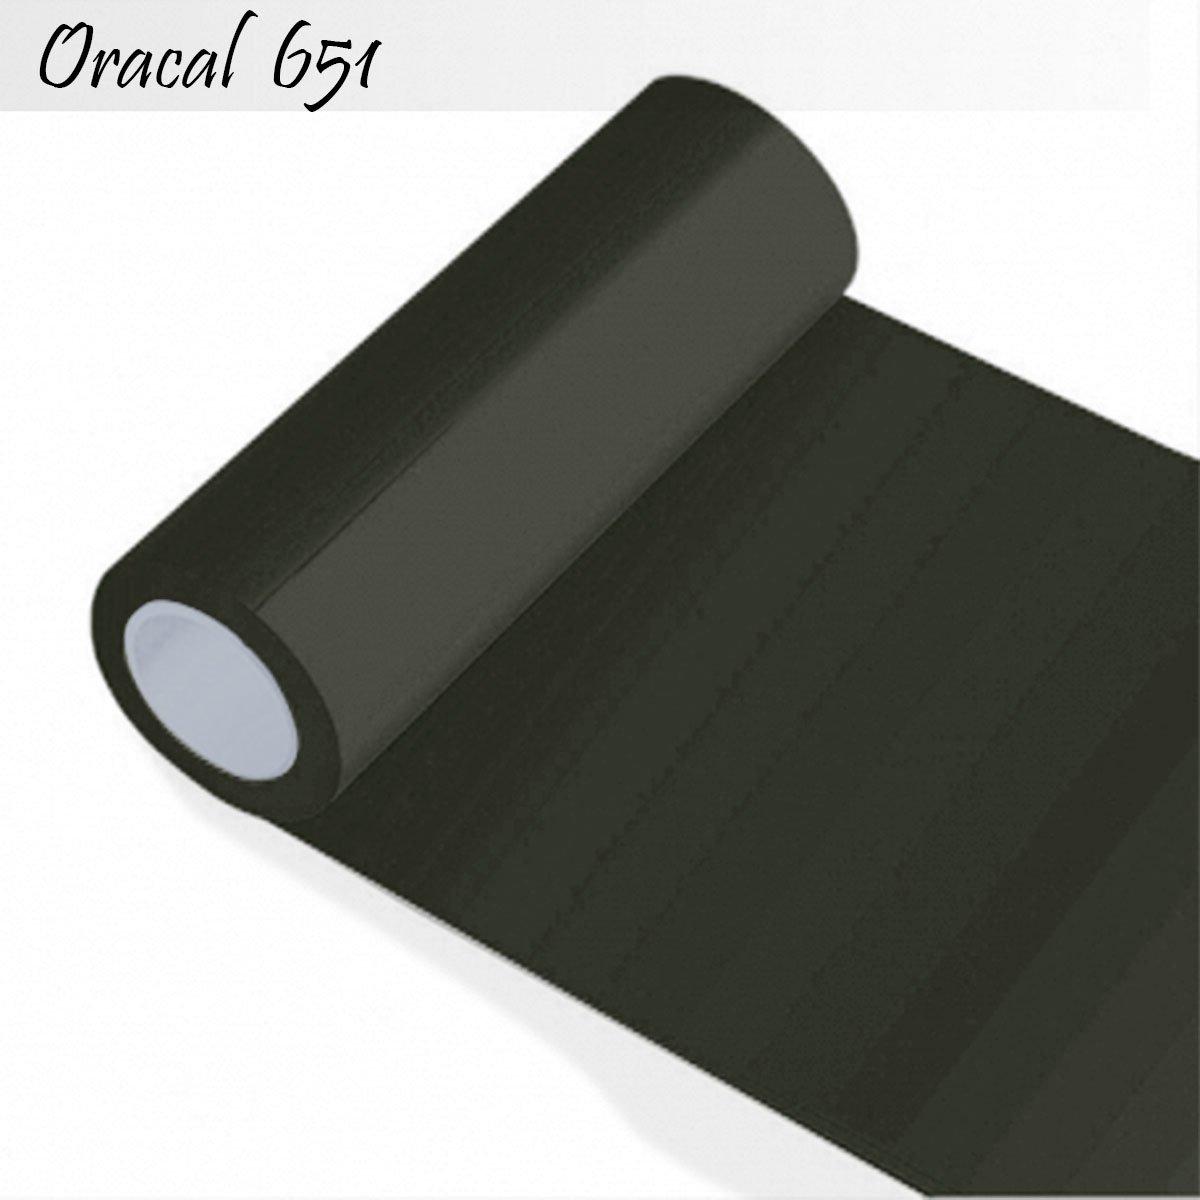 Oracal Oracal Oracal 651 - Orafol Folie 10m (Laufmeter) freie Farbwahl 55 glänzende Farben - glanz in 4 Größen, 63 cm Folienhöhe - Farbe 70 - schwarz B00TRTGH0W Wandtattoos & Wandbilder 86ae48